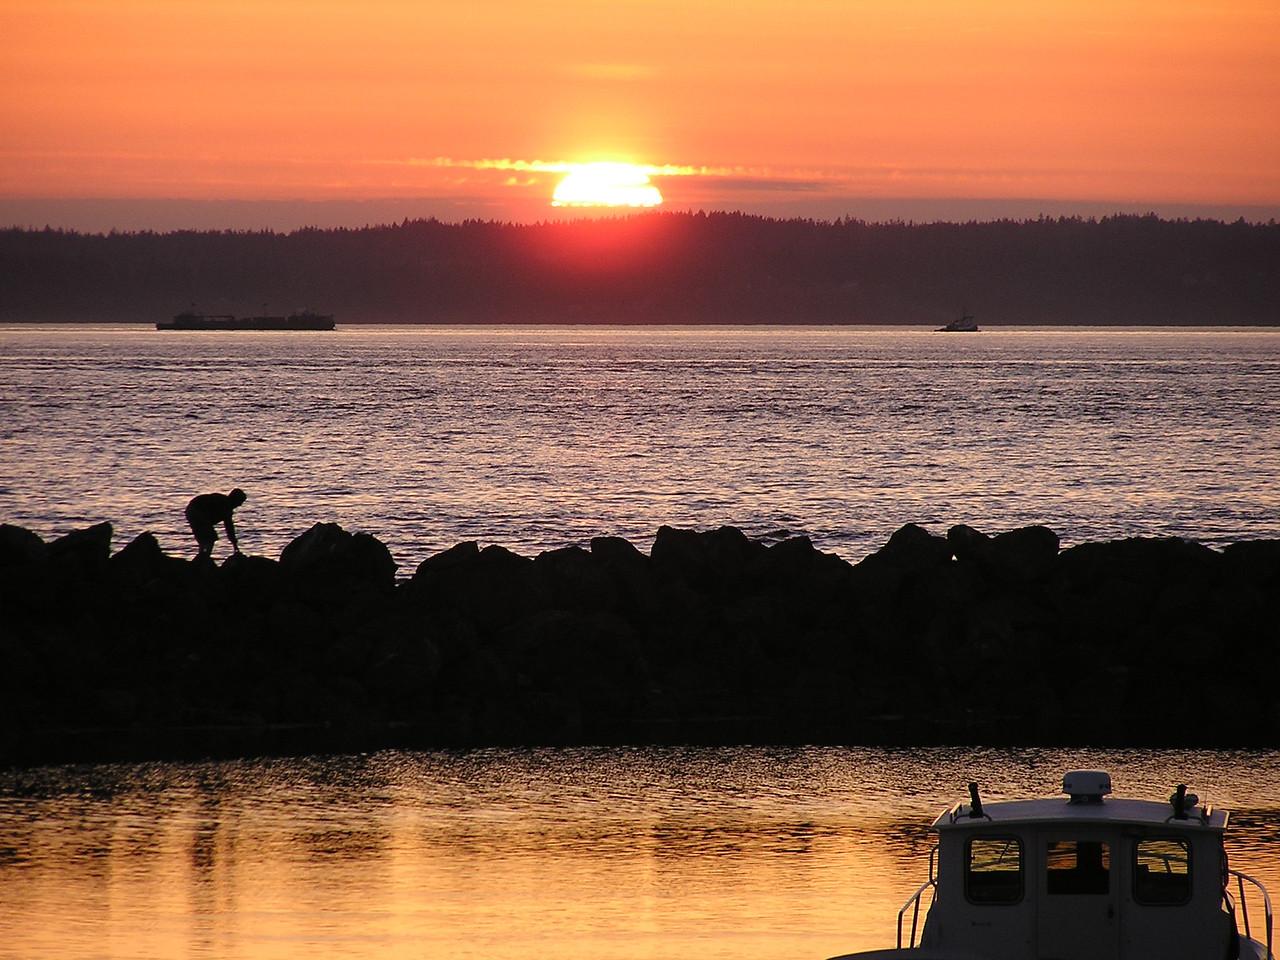 07 06 20 Sunset 009